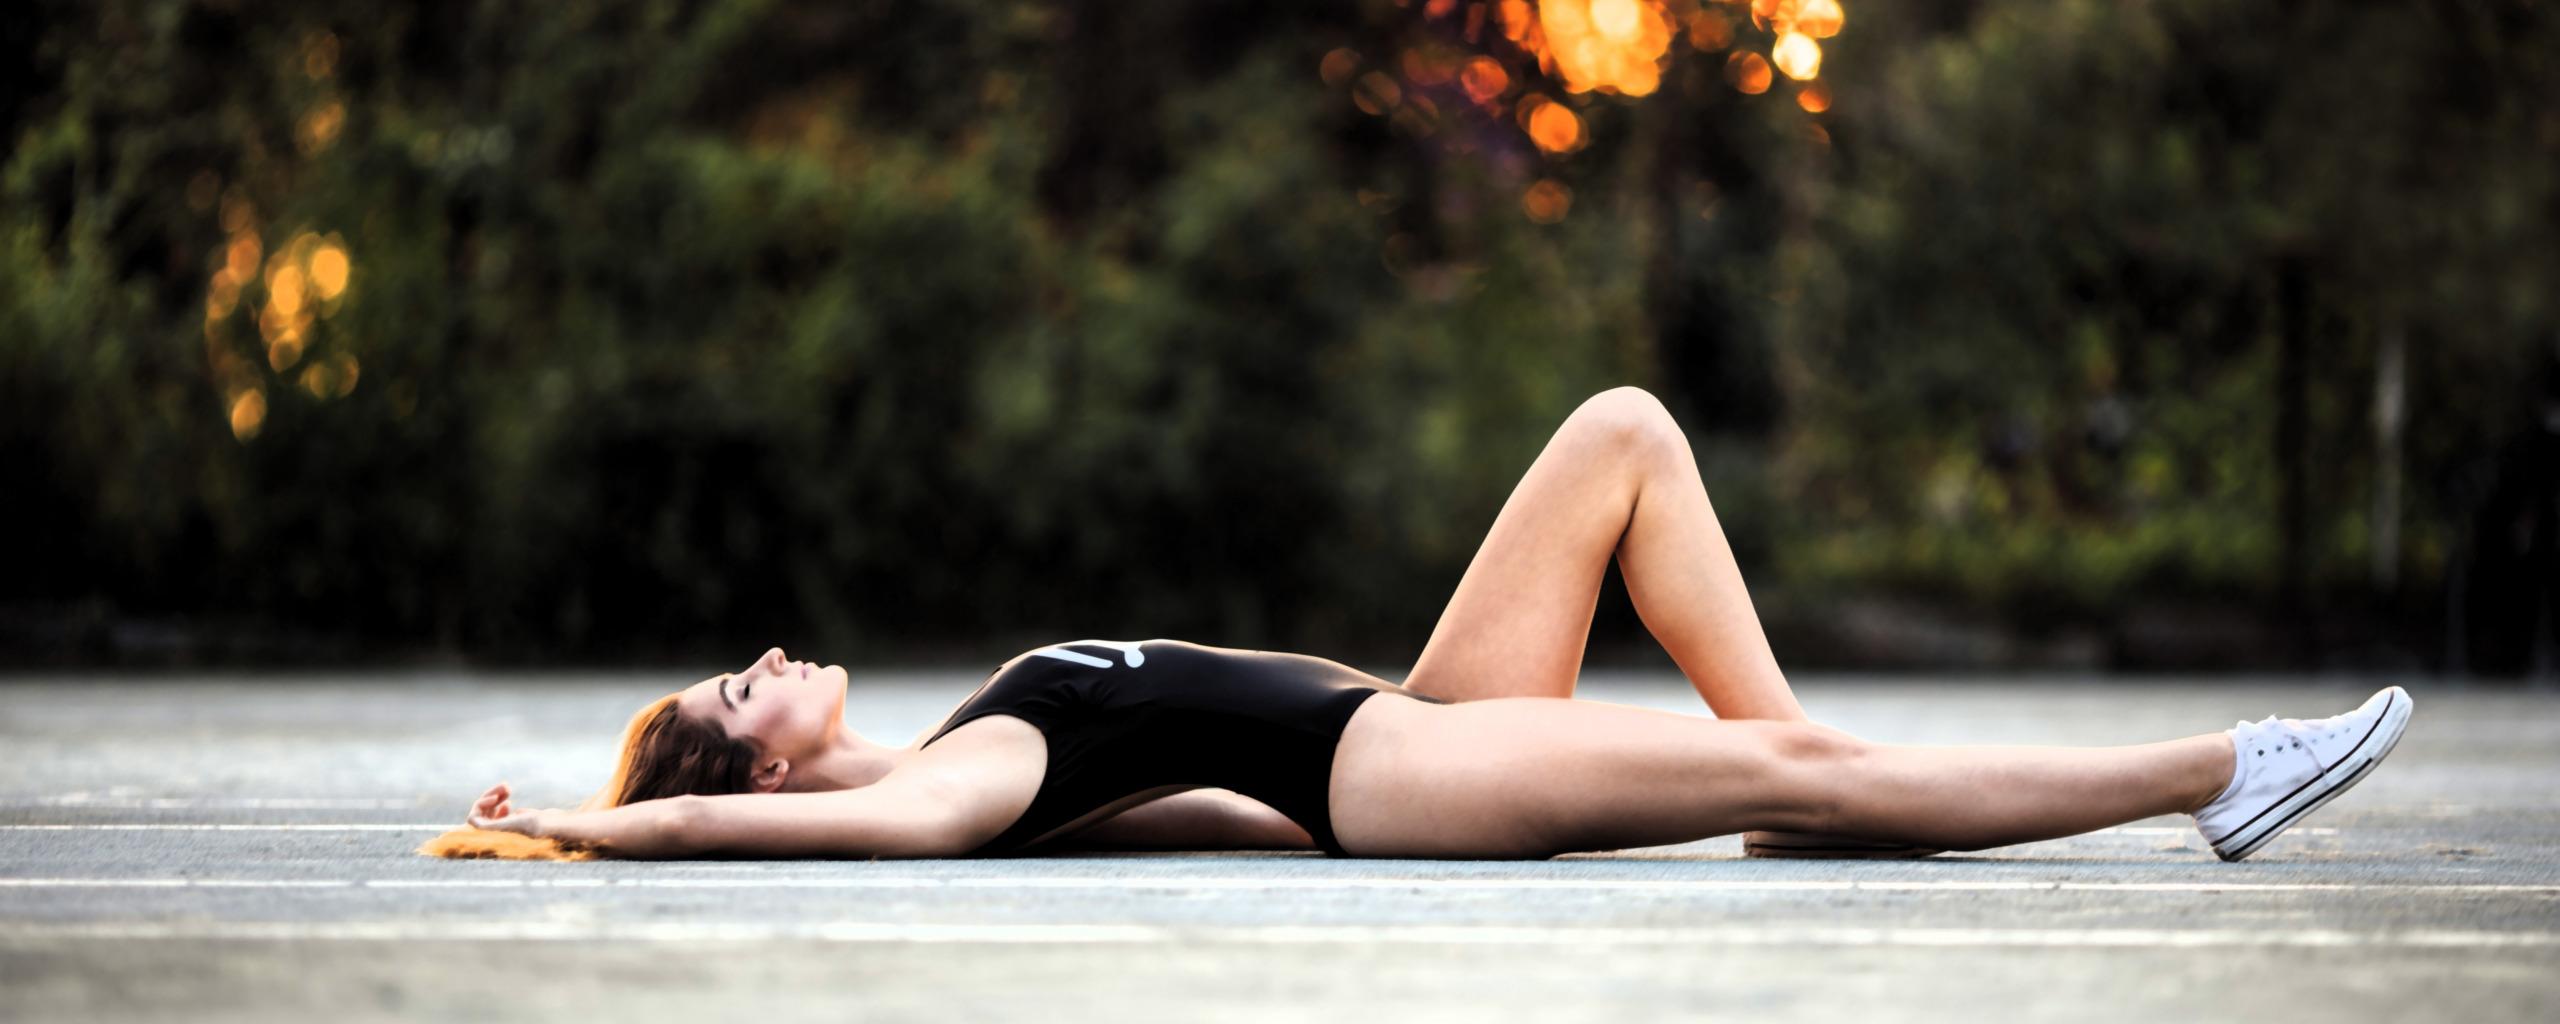 Девушка лежит на спине фото